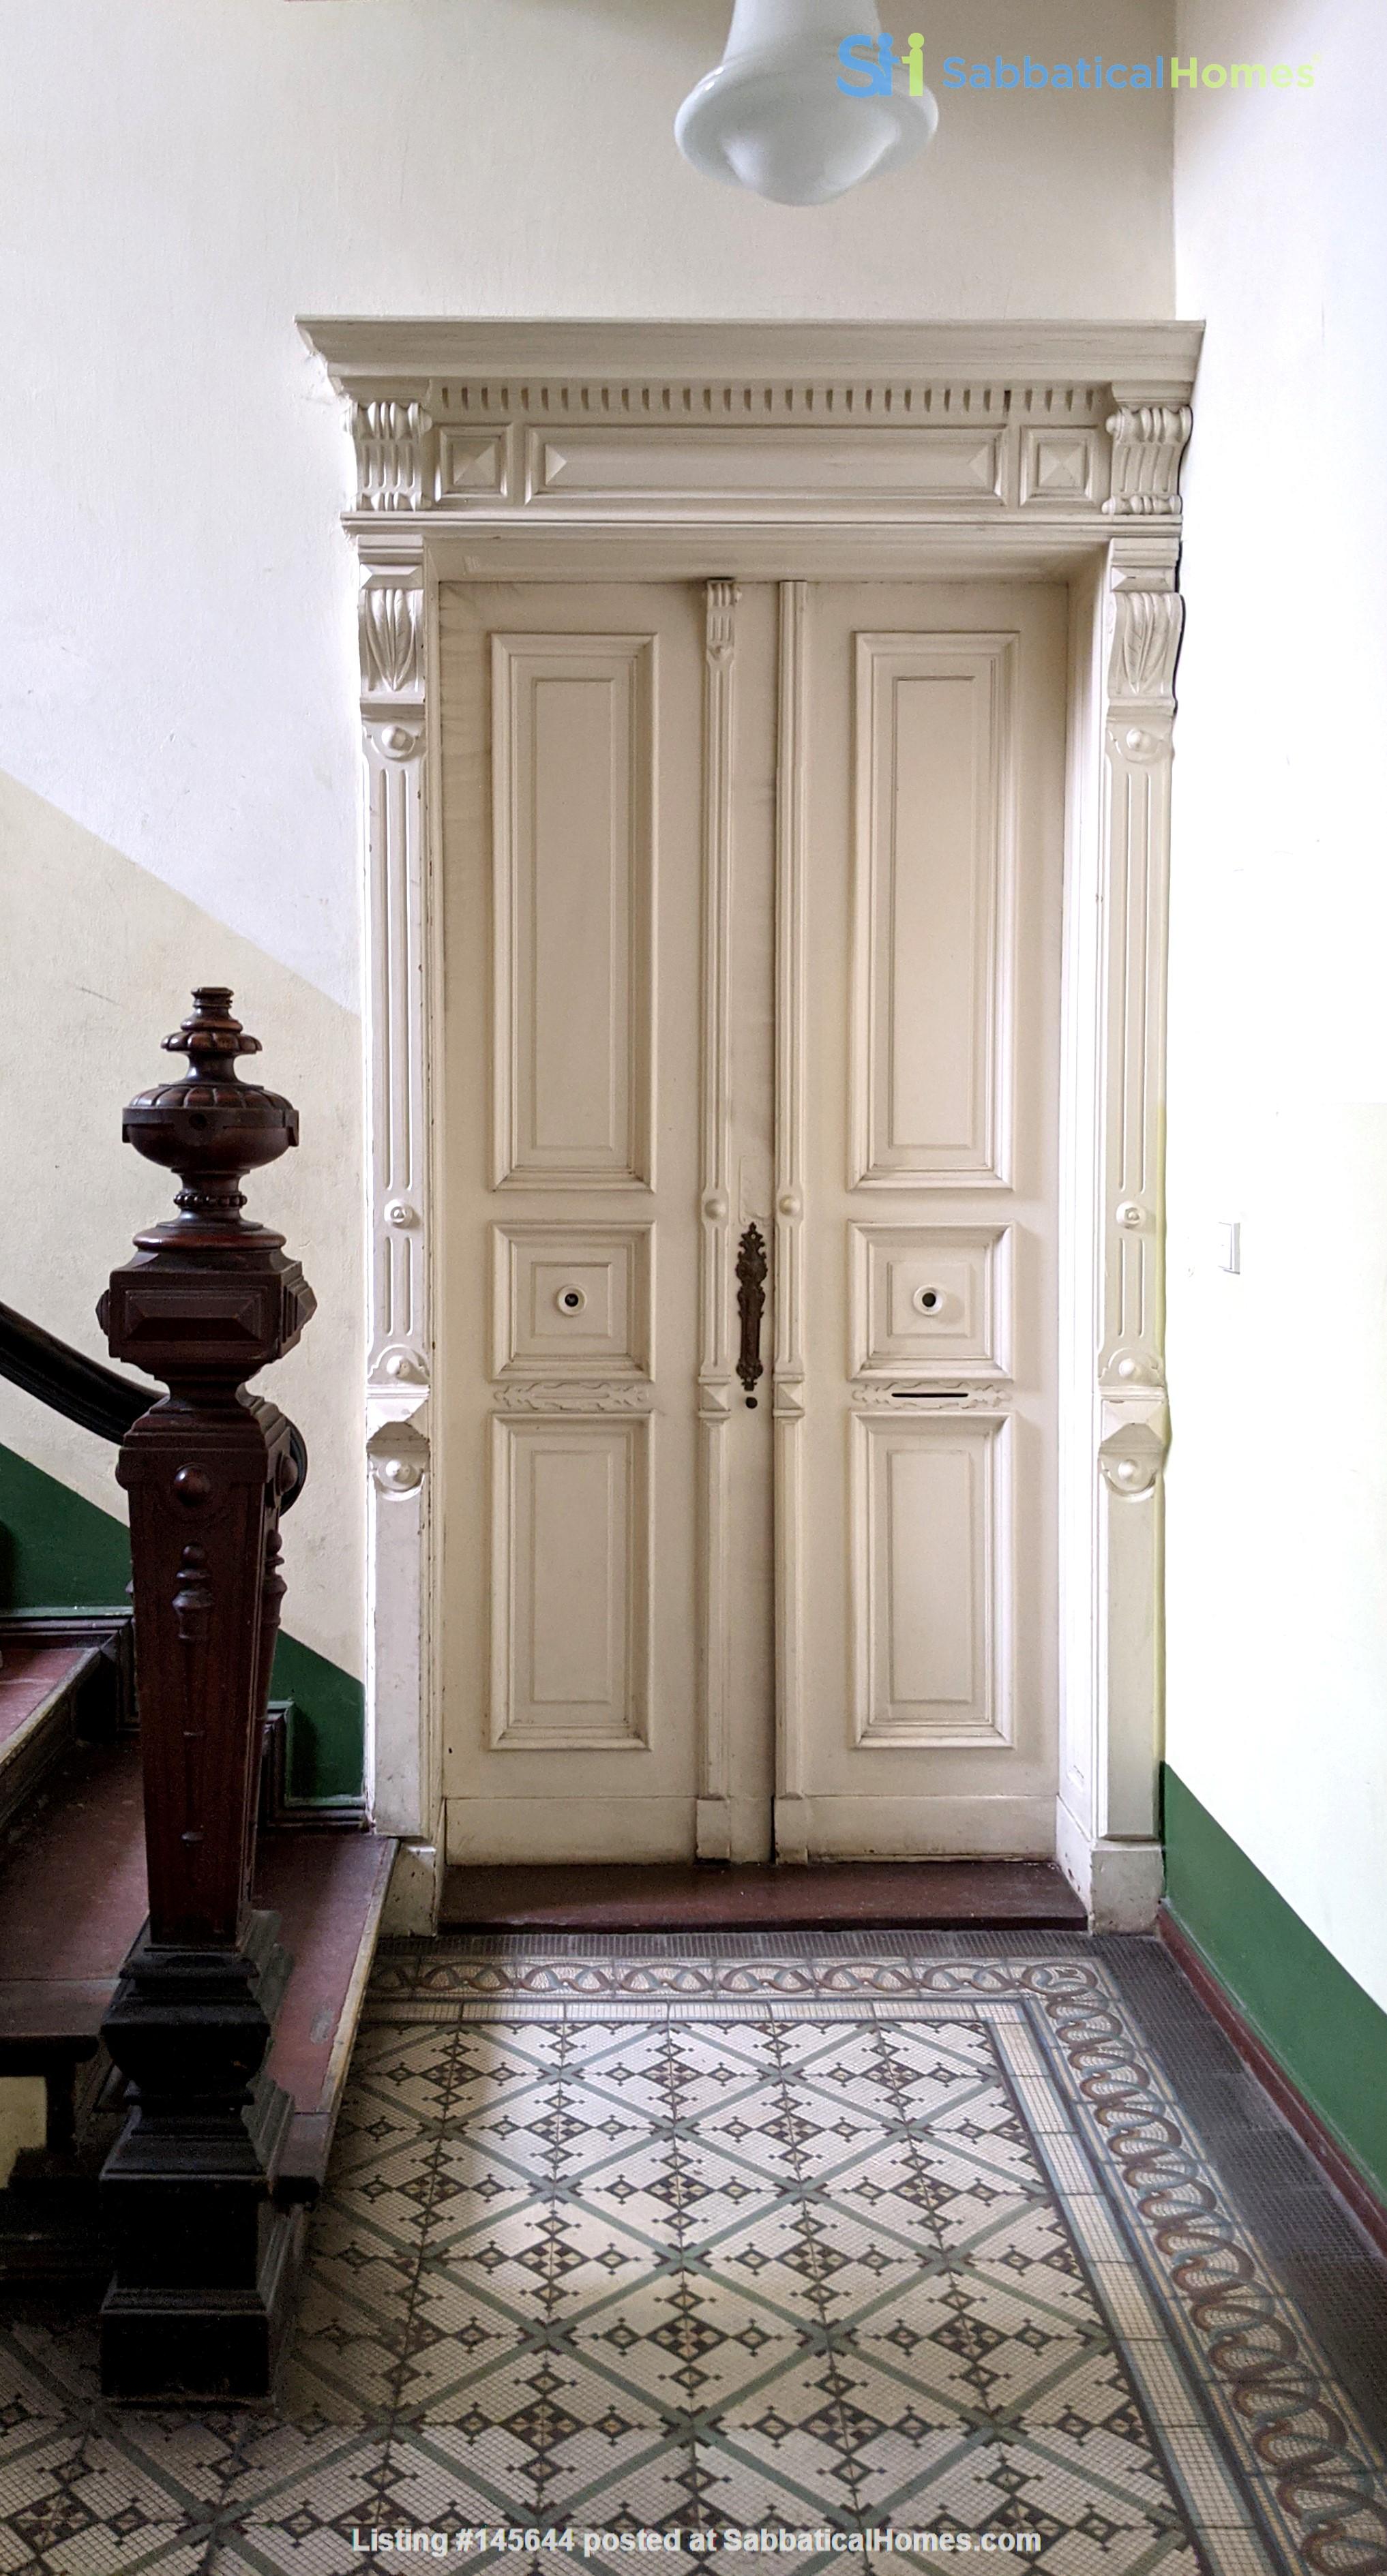 September-November: Your Brooklyn NYC for my Berlin Wedding-Mitte Home Exchange in Berlin, Berlin, Germany 2